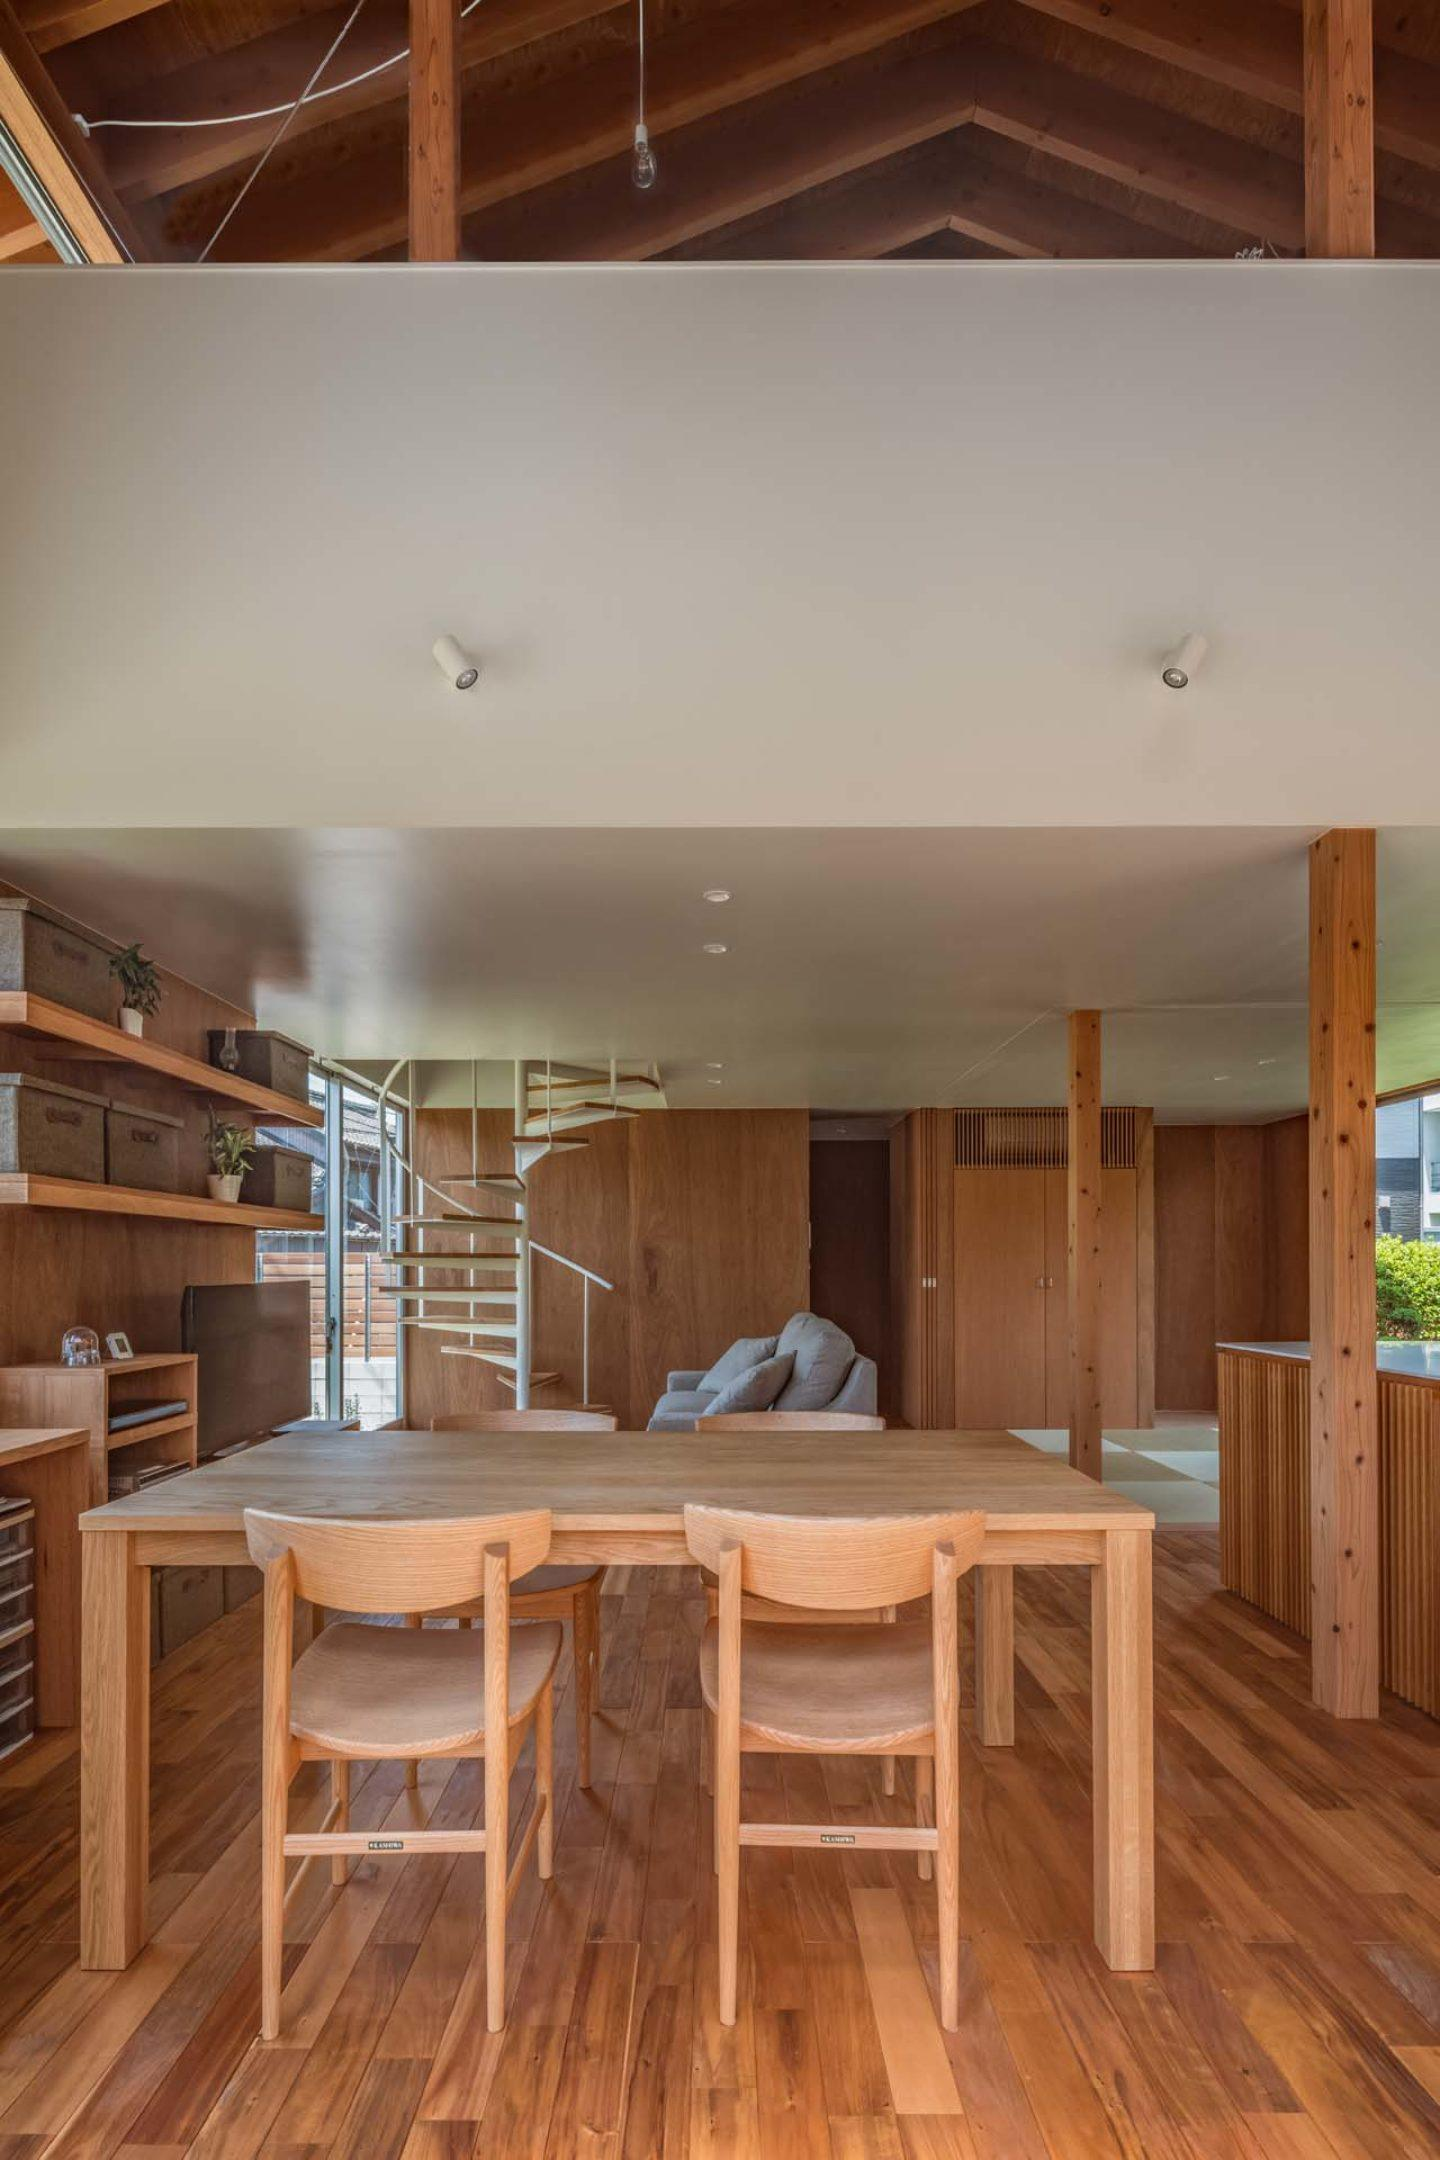 IGNANT-Architecture-Kota-Mizuishi-House-In-Otai-006